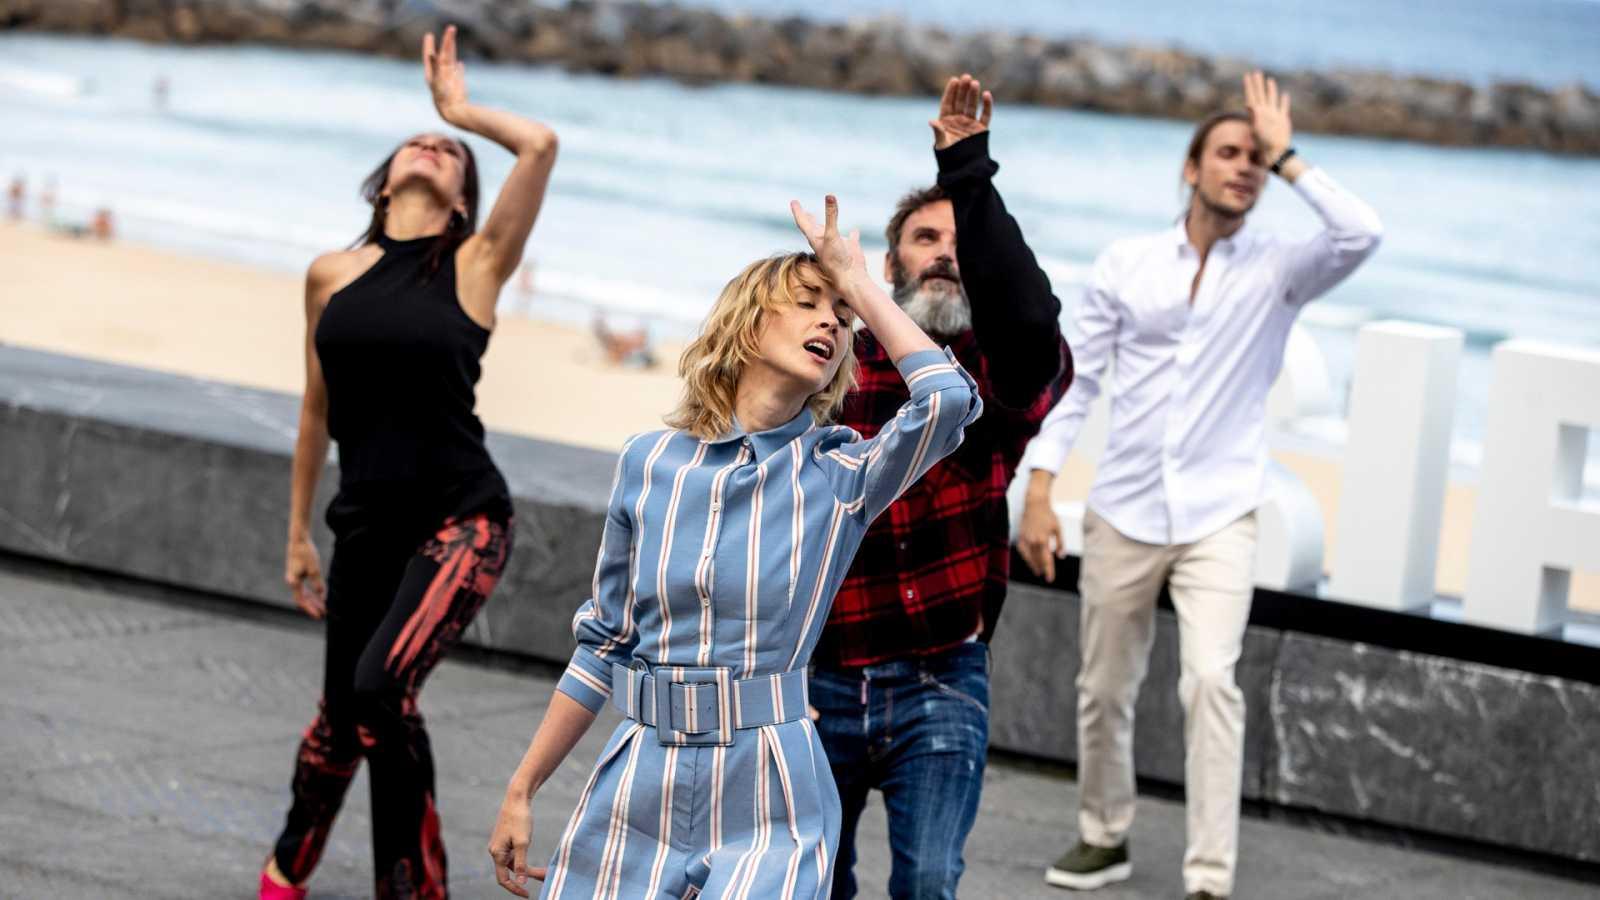 Los actores de 'Explota, explota' rompen a bailar en el Festival de San  Sebastián 2020